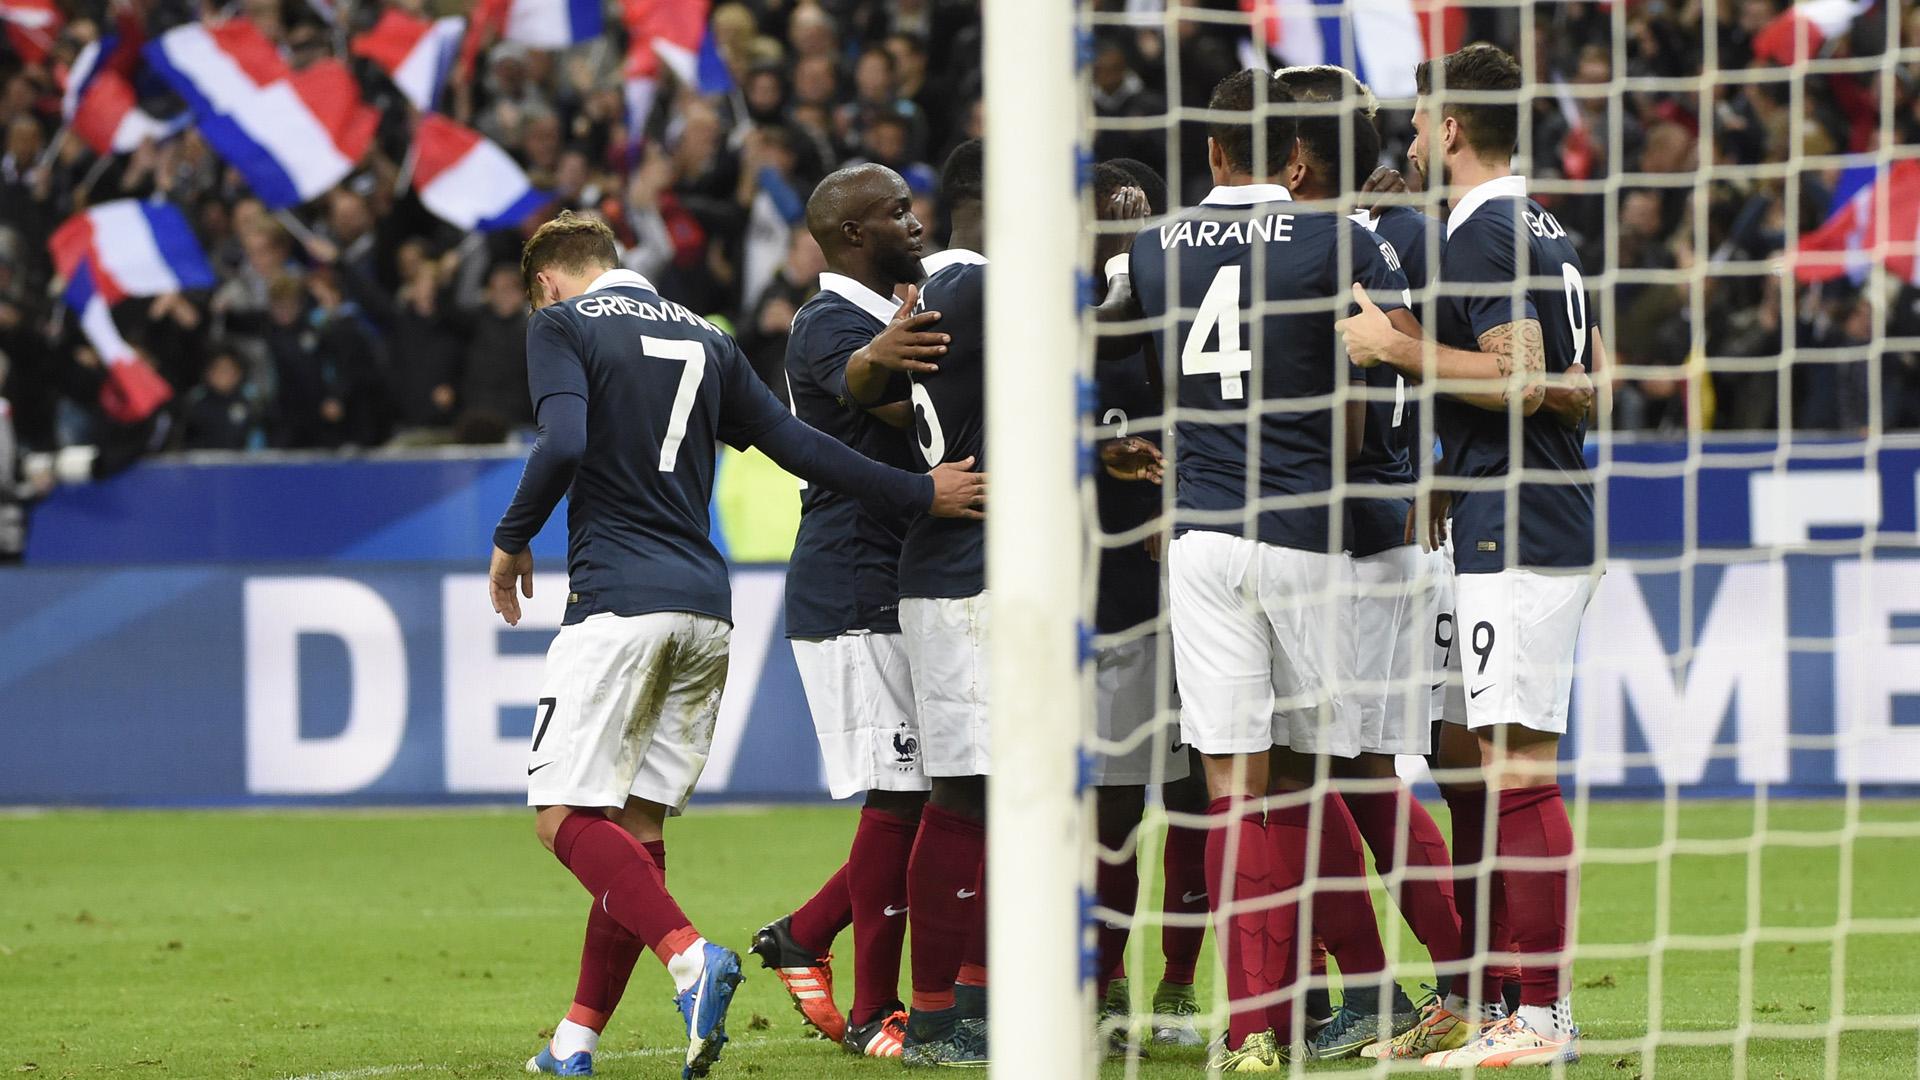 france 2  11  15 matchs